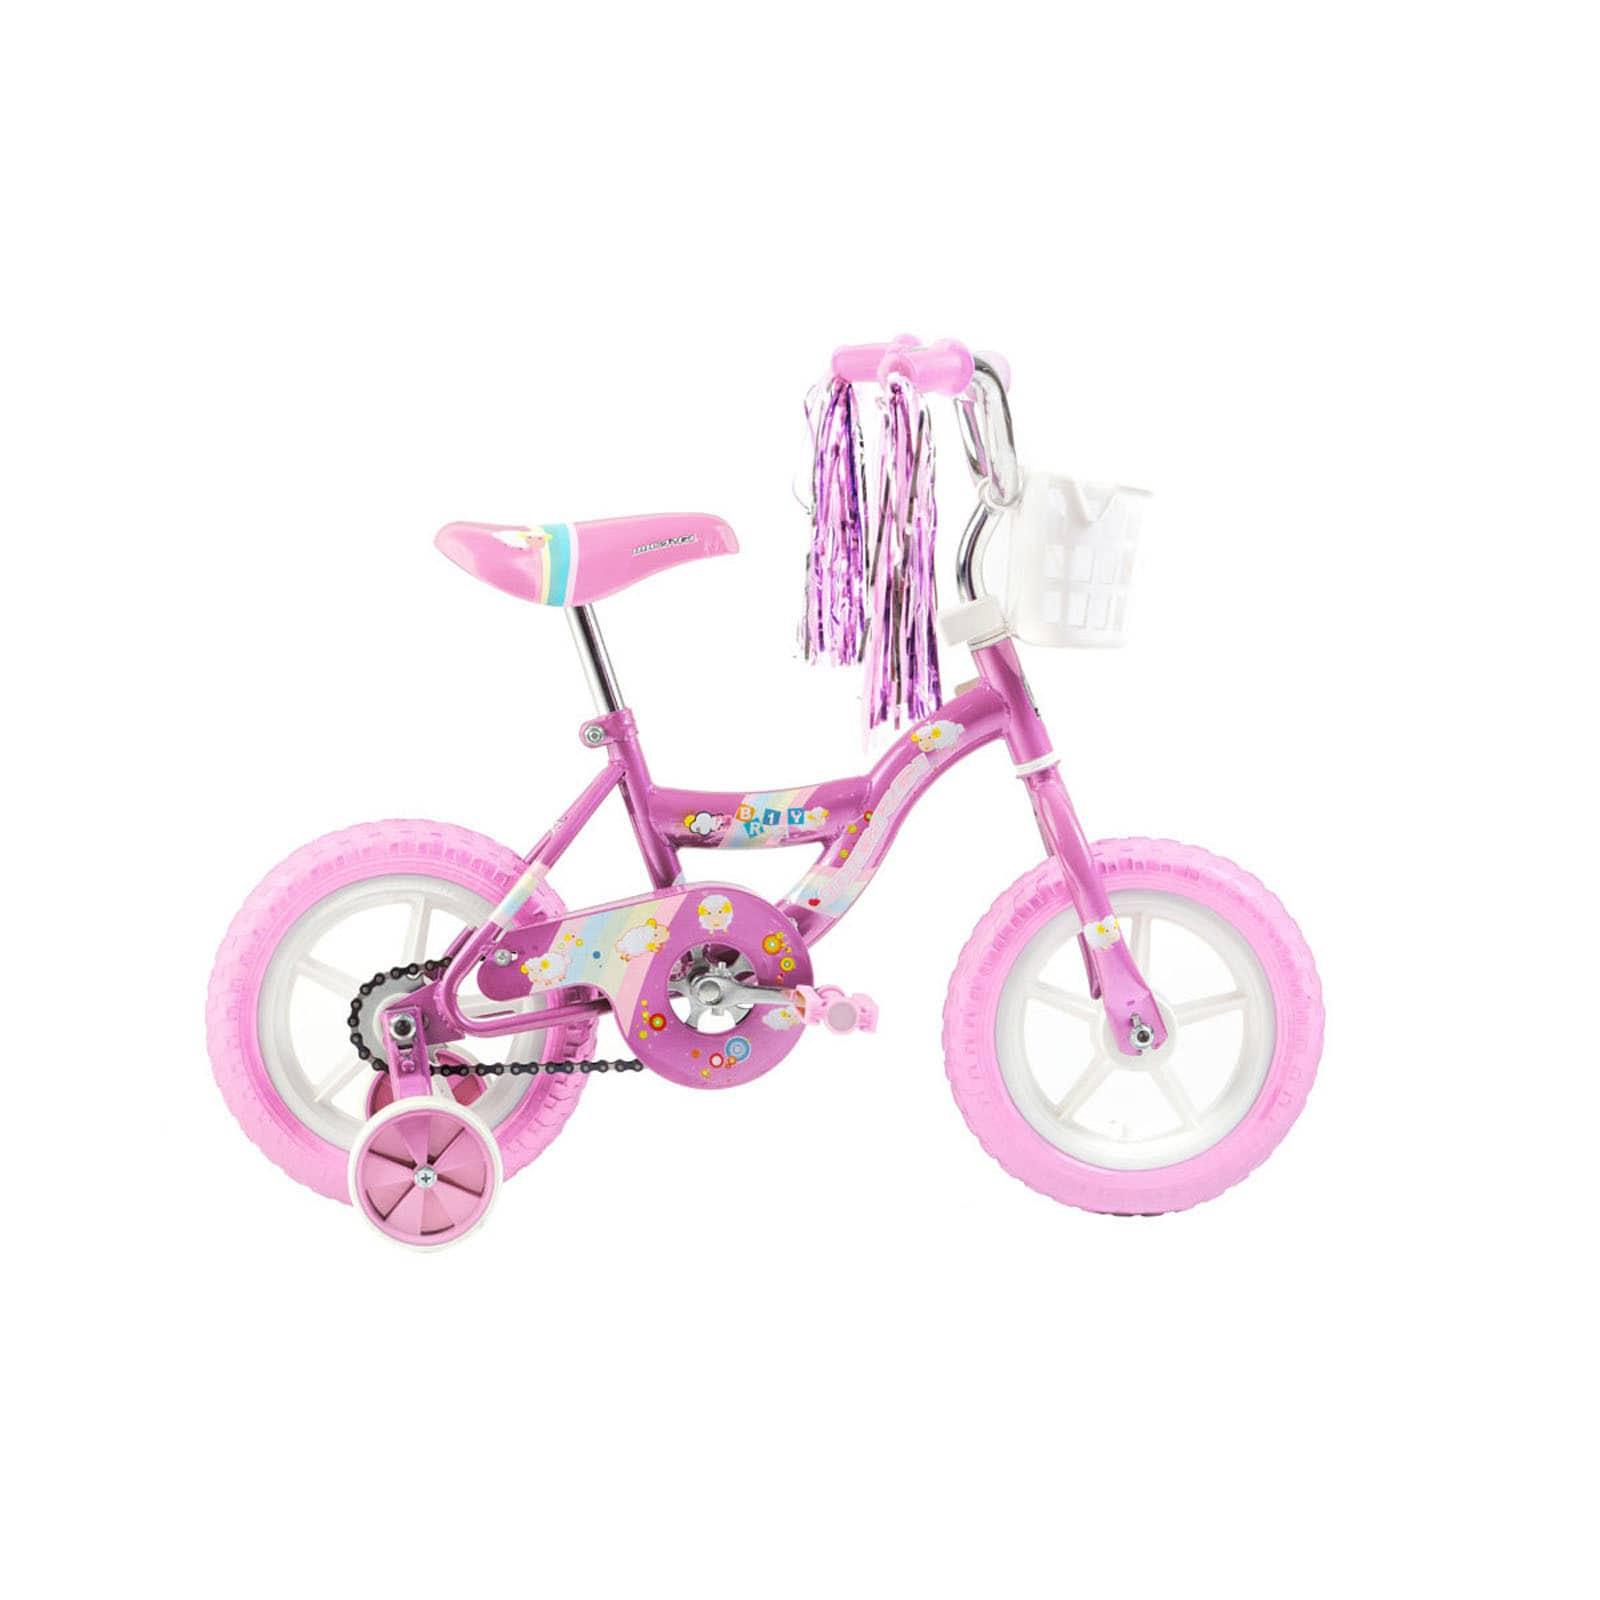 Micargi Kids Pink Girls 12-inch Bicycle with Training Whe...